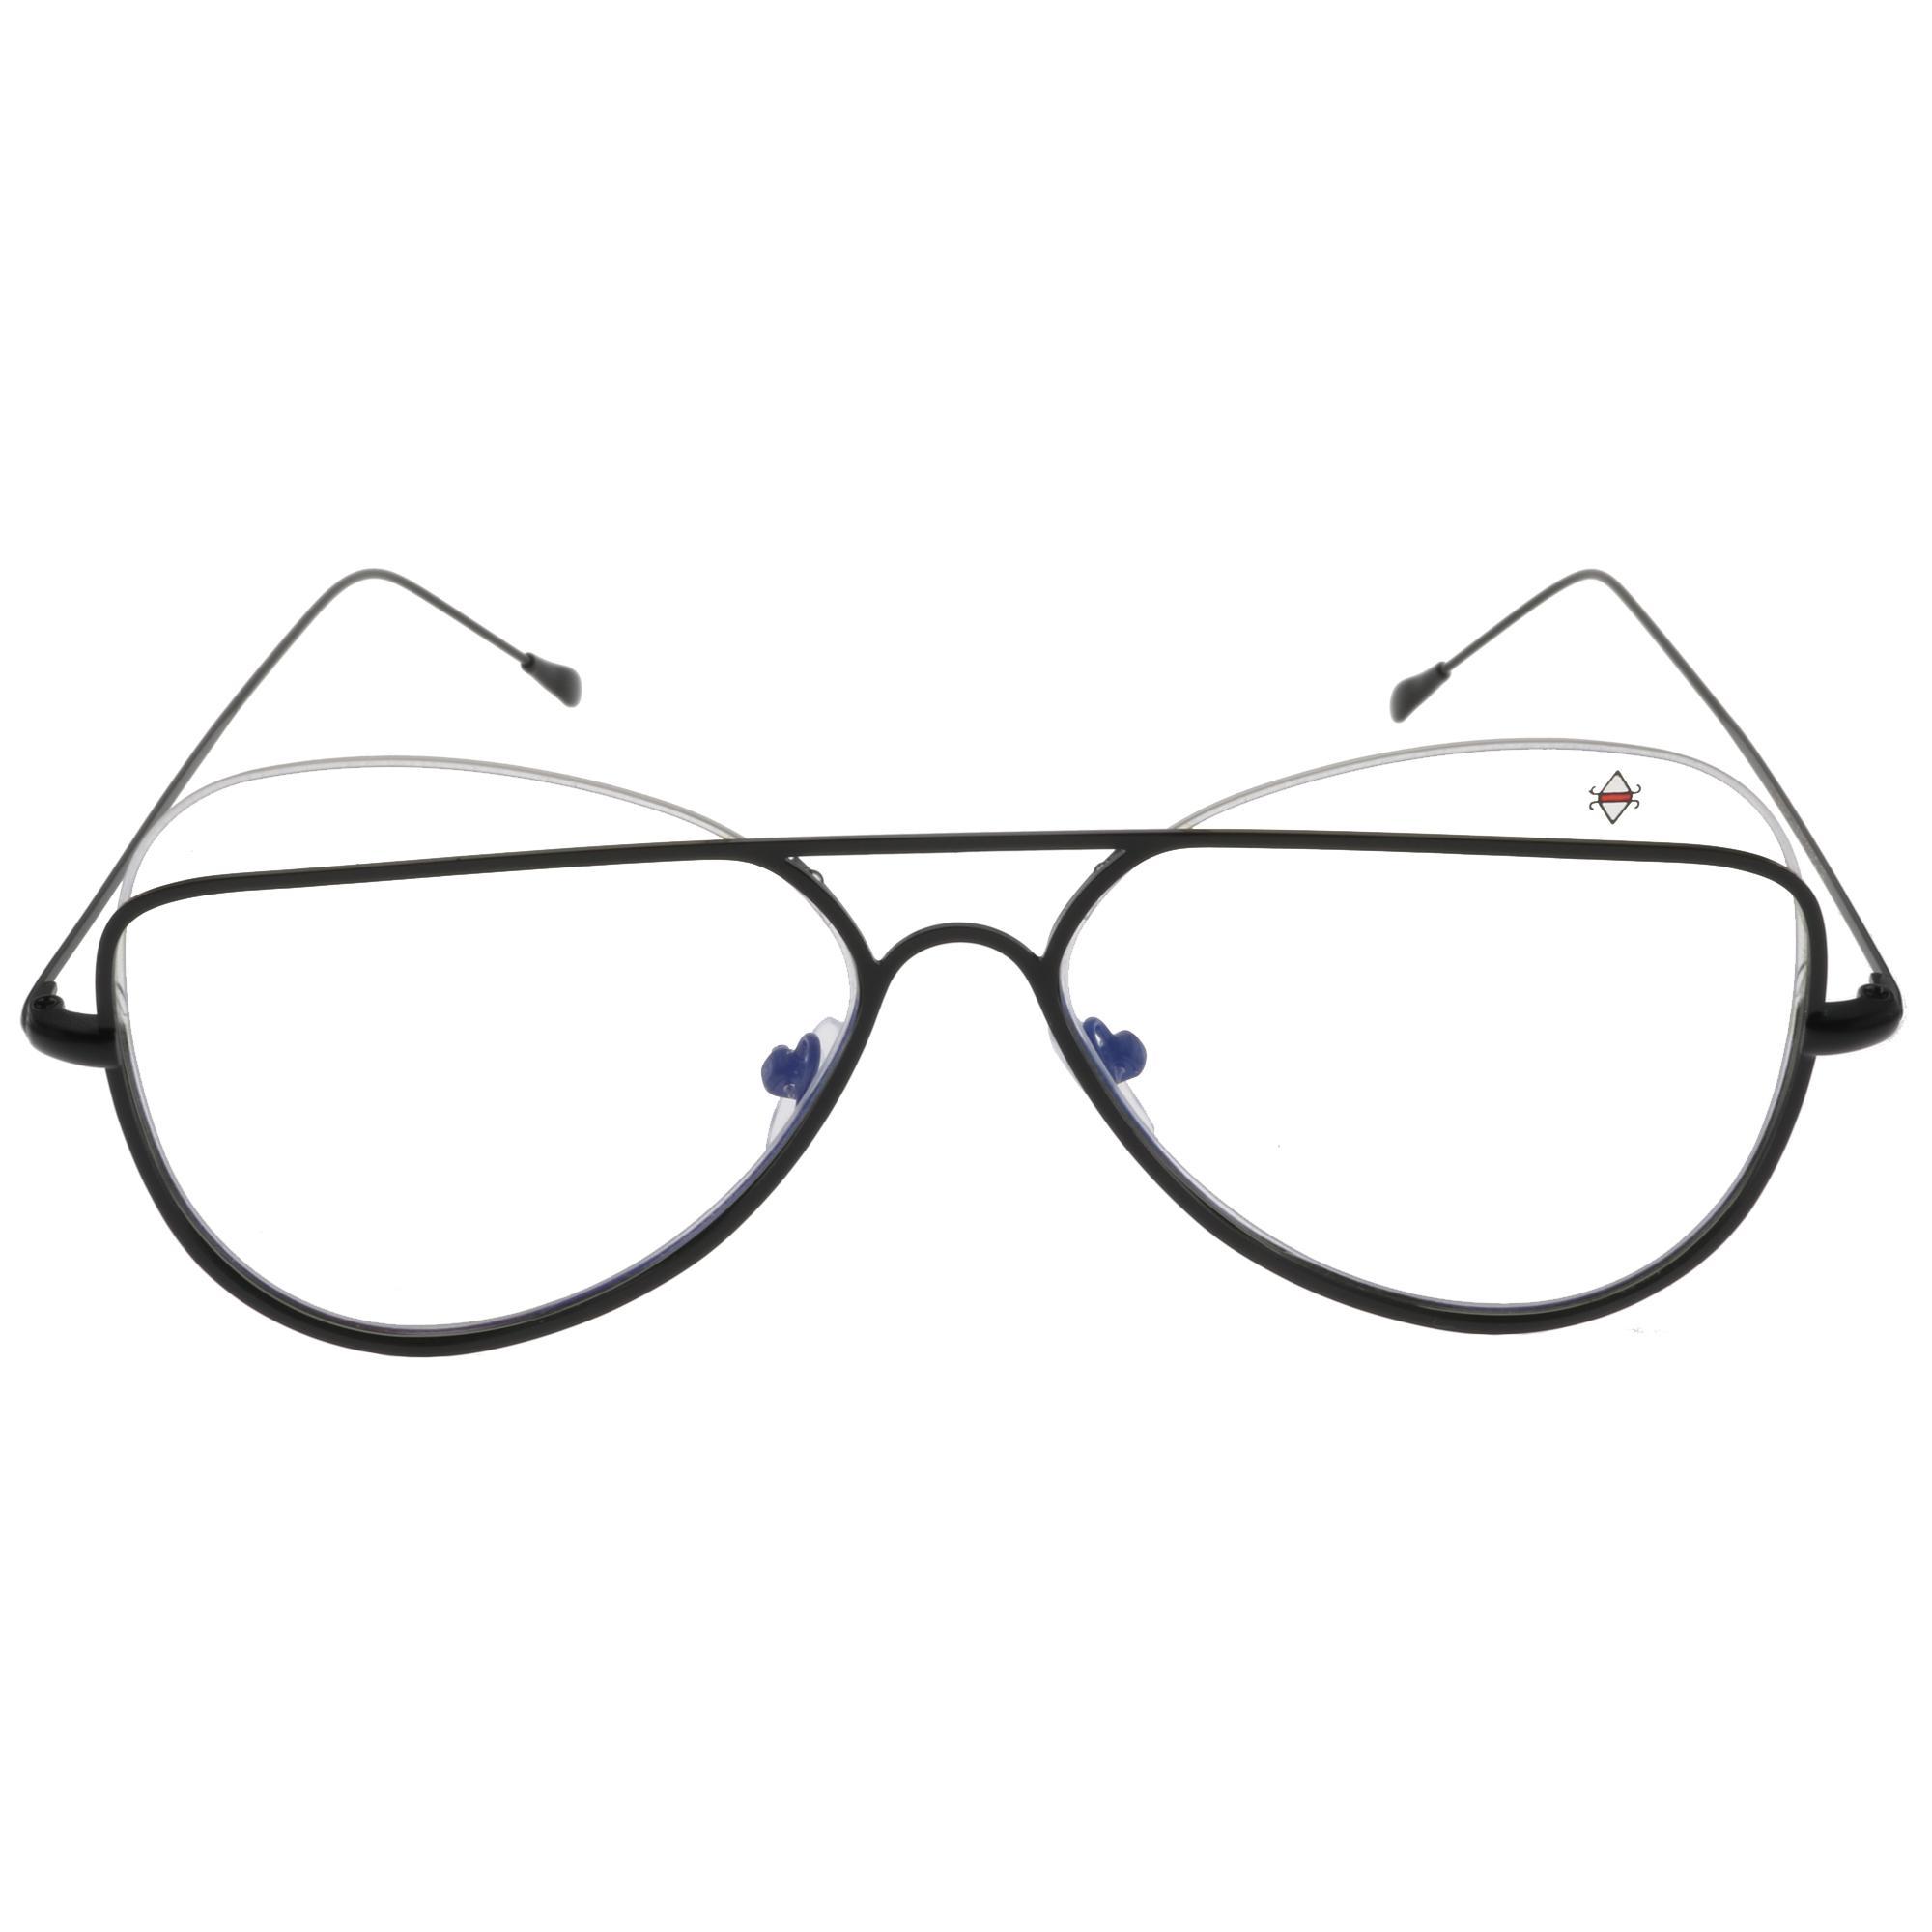 710145bd610 136 items found in Antepara · FY10113-Q-C2 Sunglasses Black Frame White  Lens (55-23-130